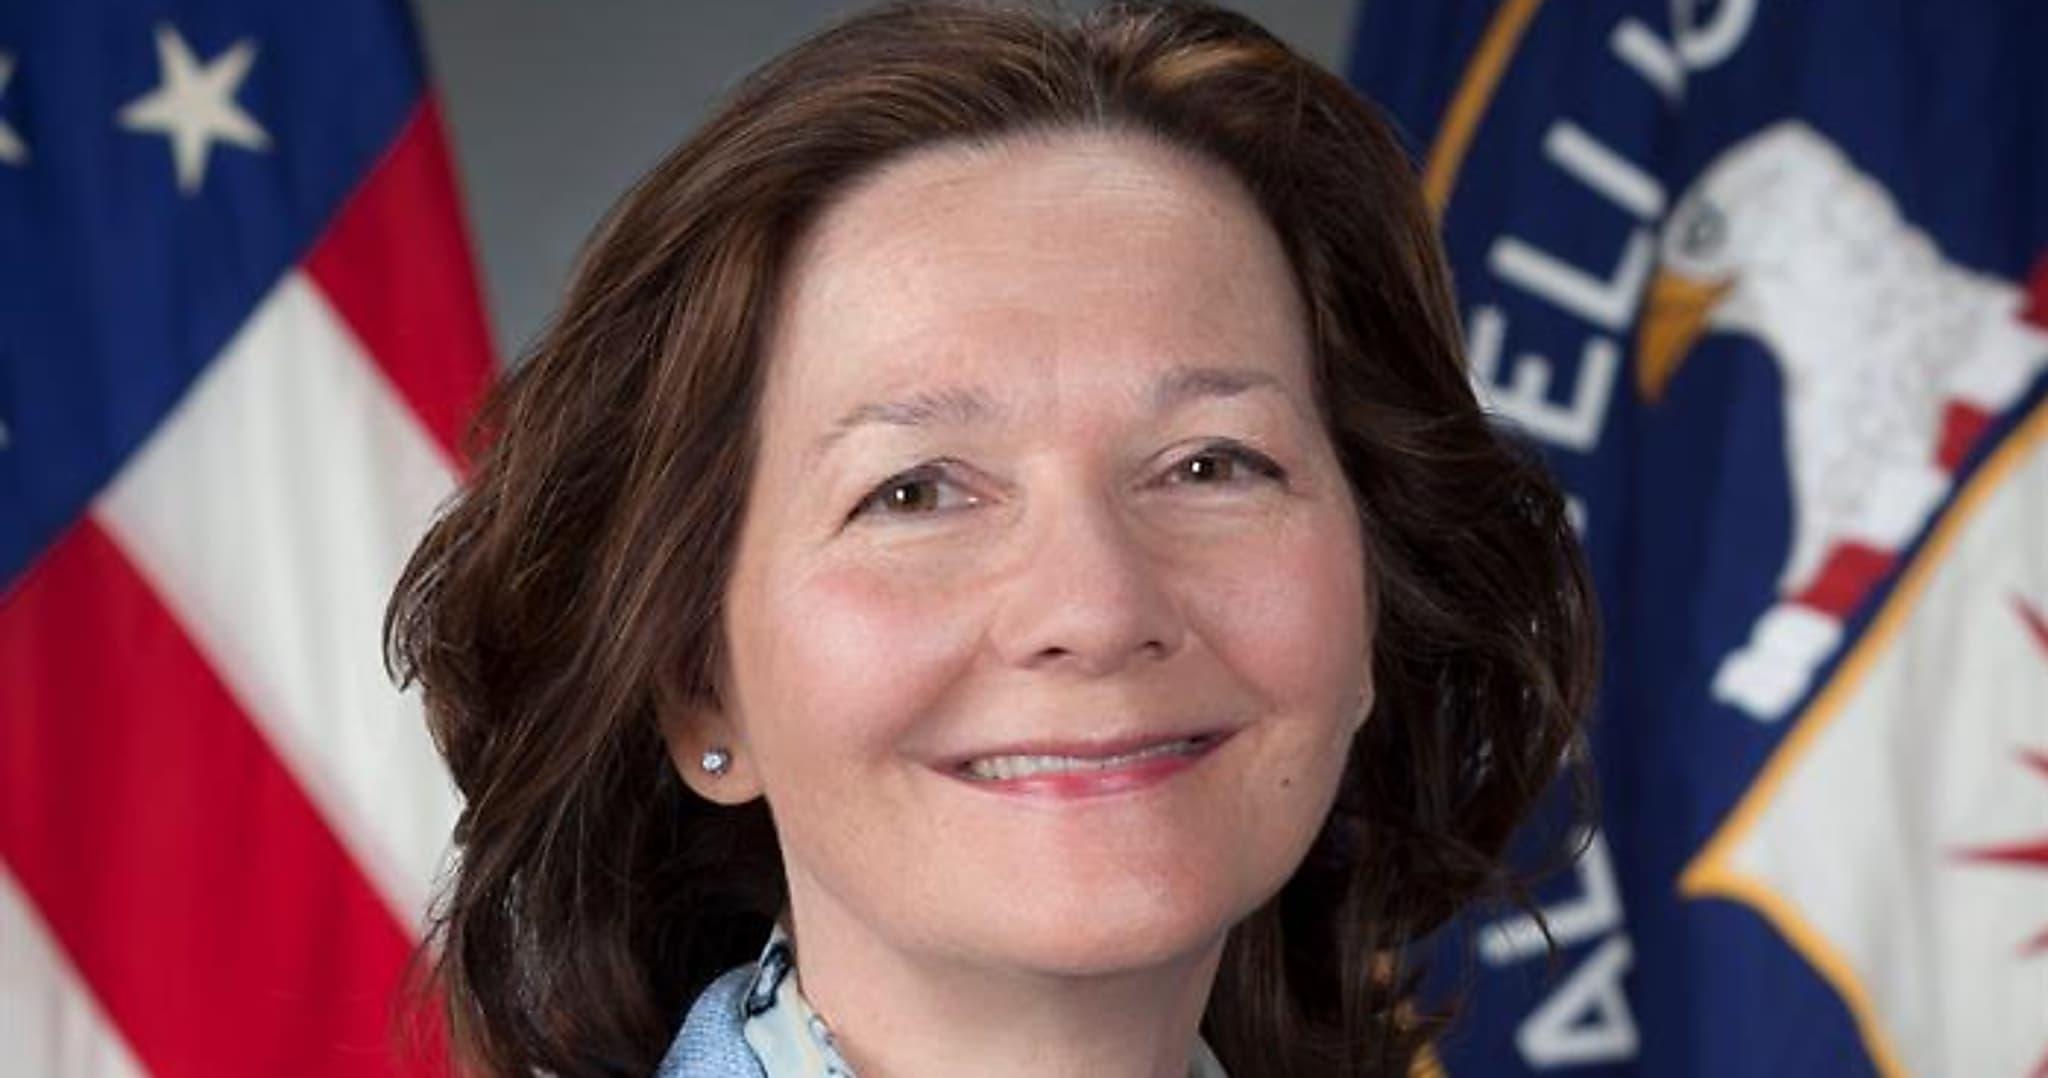 El Senado Confirma A Gina Haspel Como Directora De La CIA.